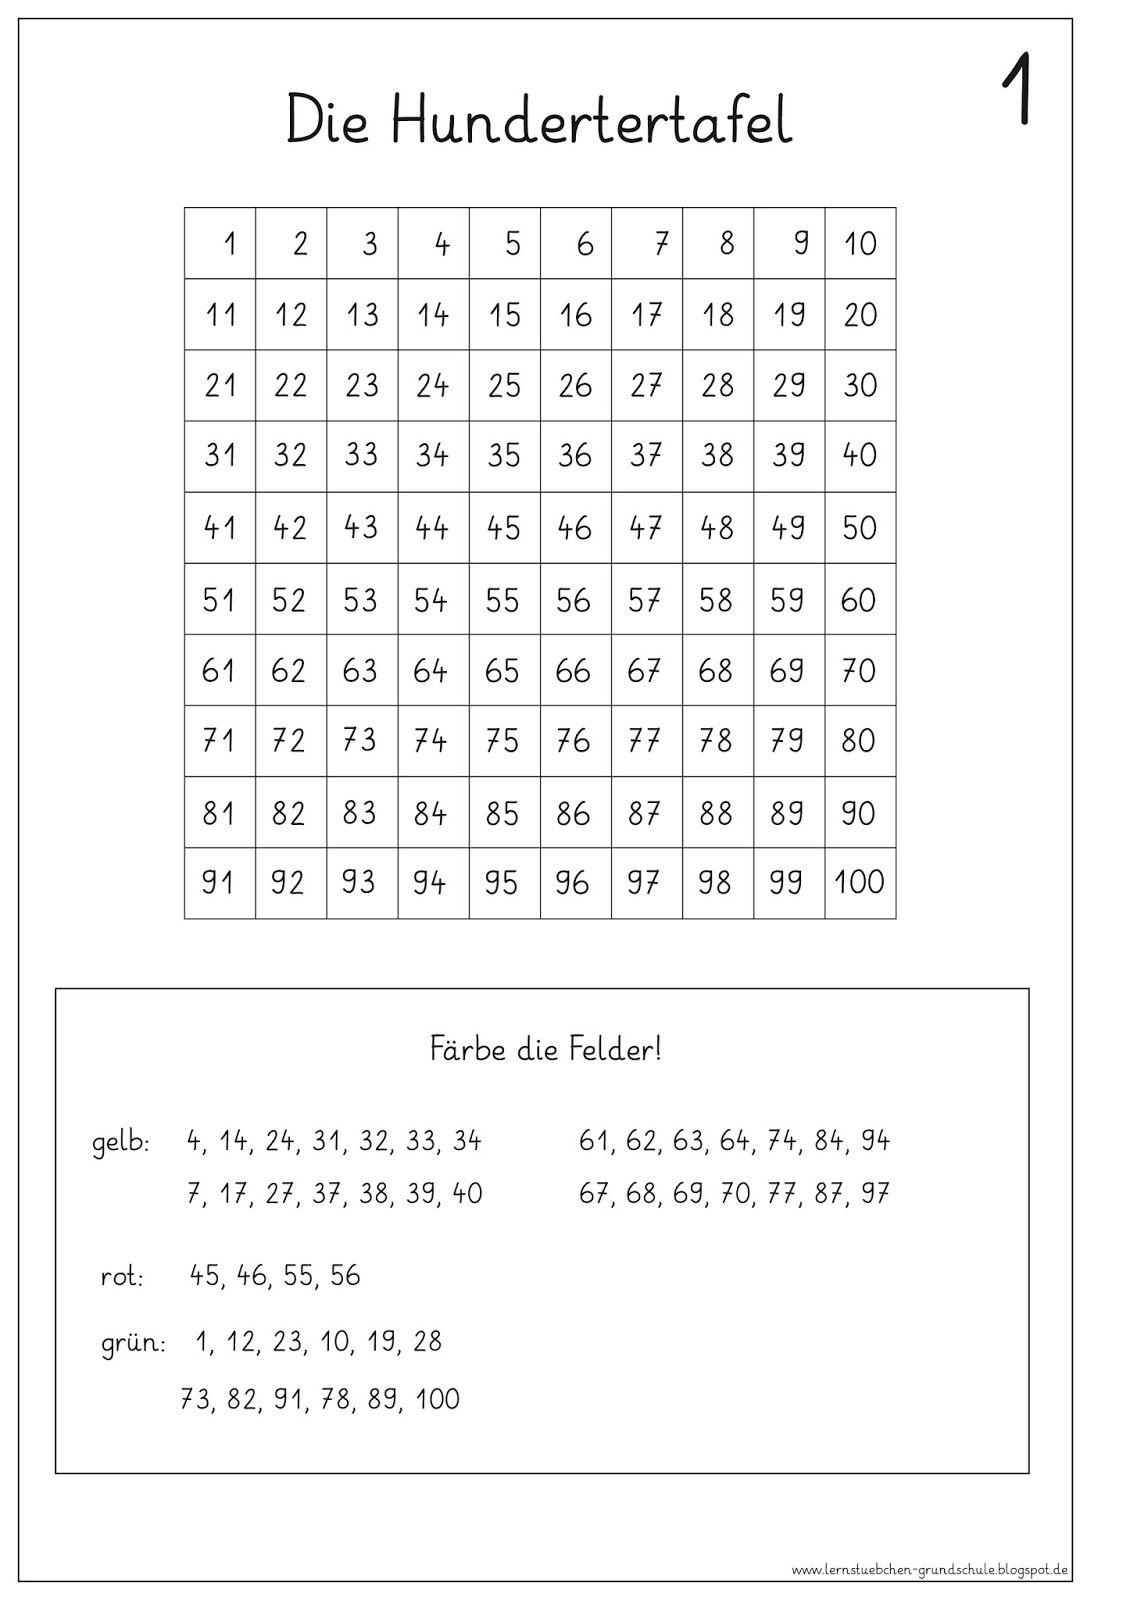 Lernstubchen Hundertertafel